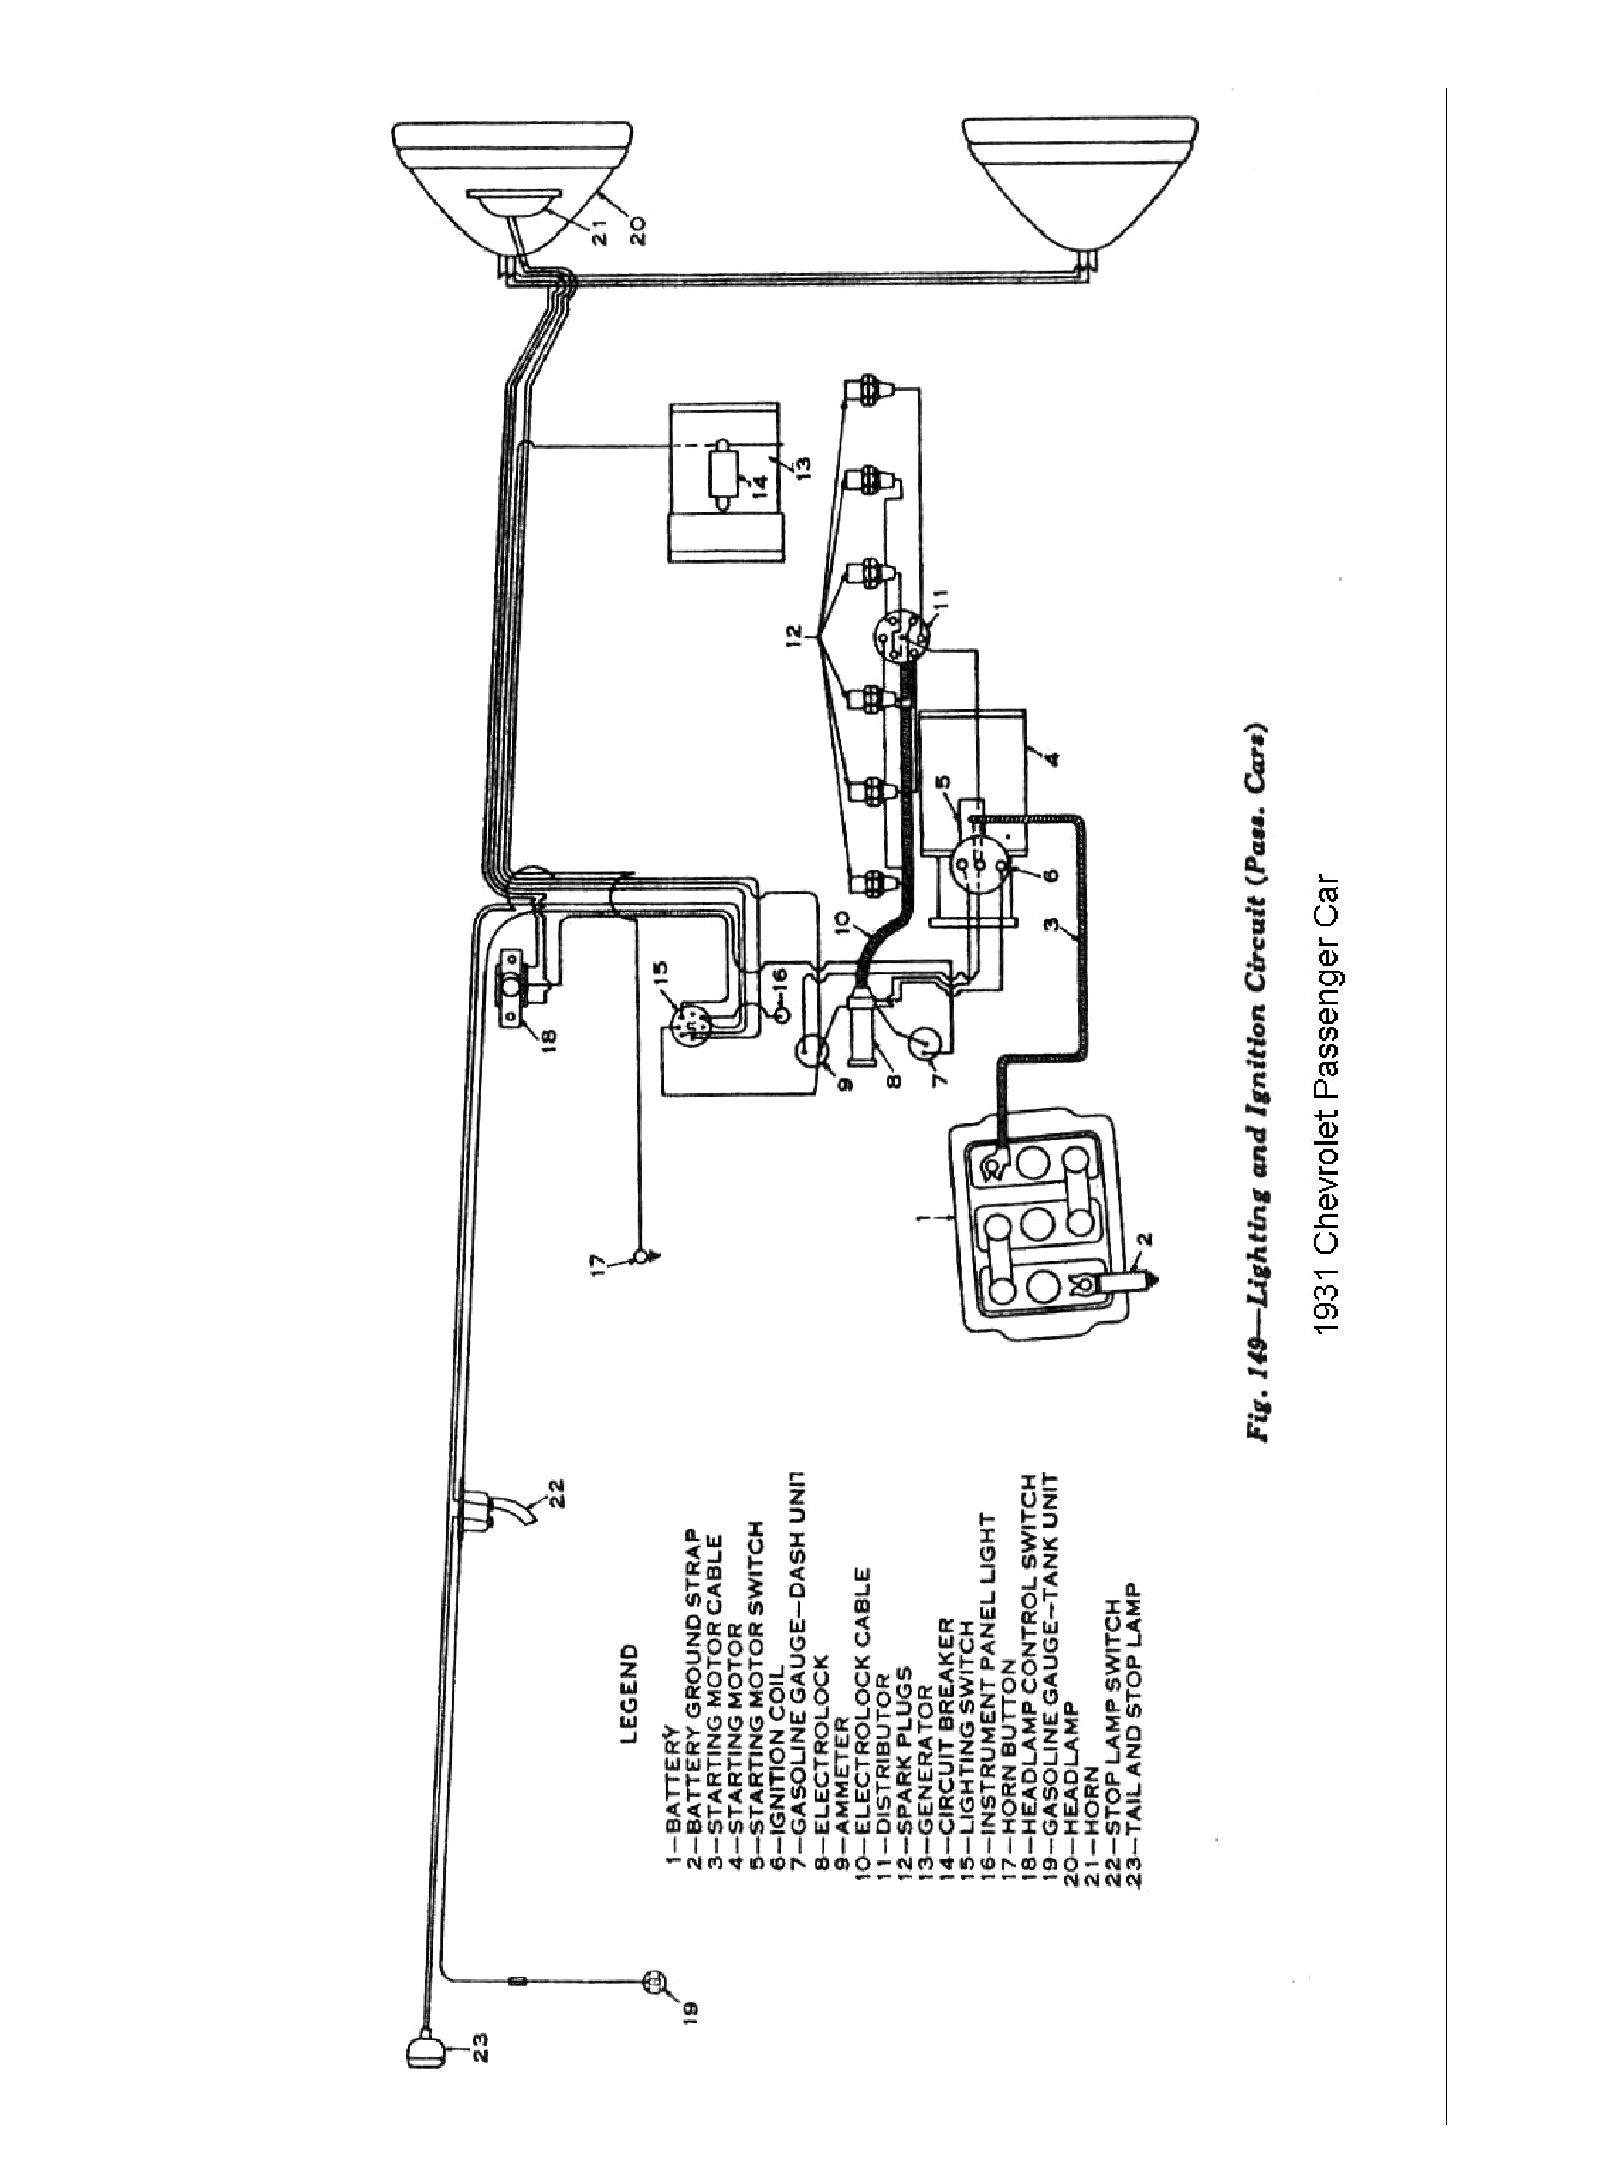 cb750 starter solenoid wiring diagram